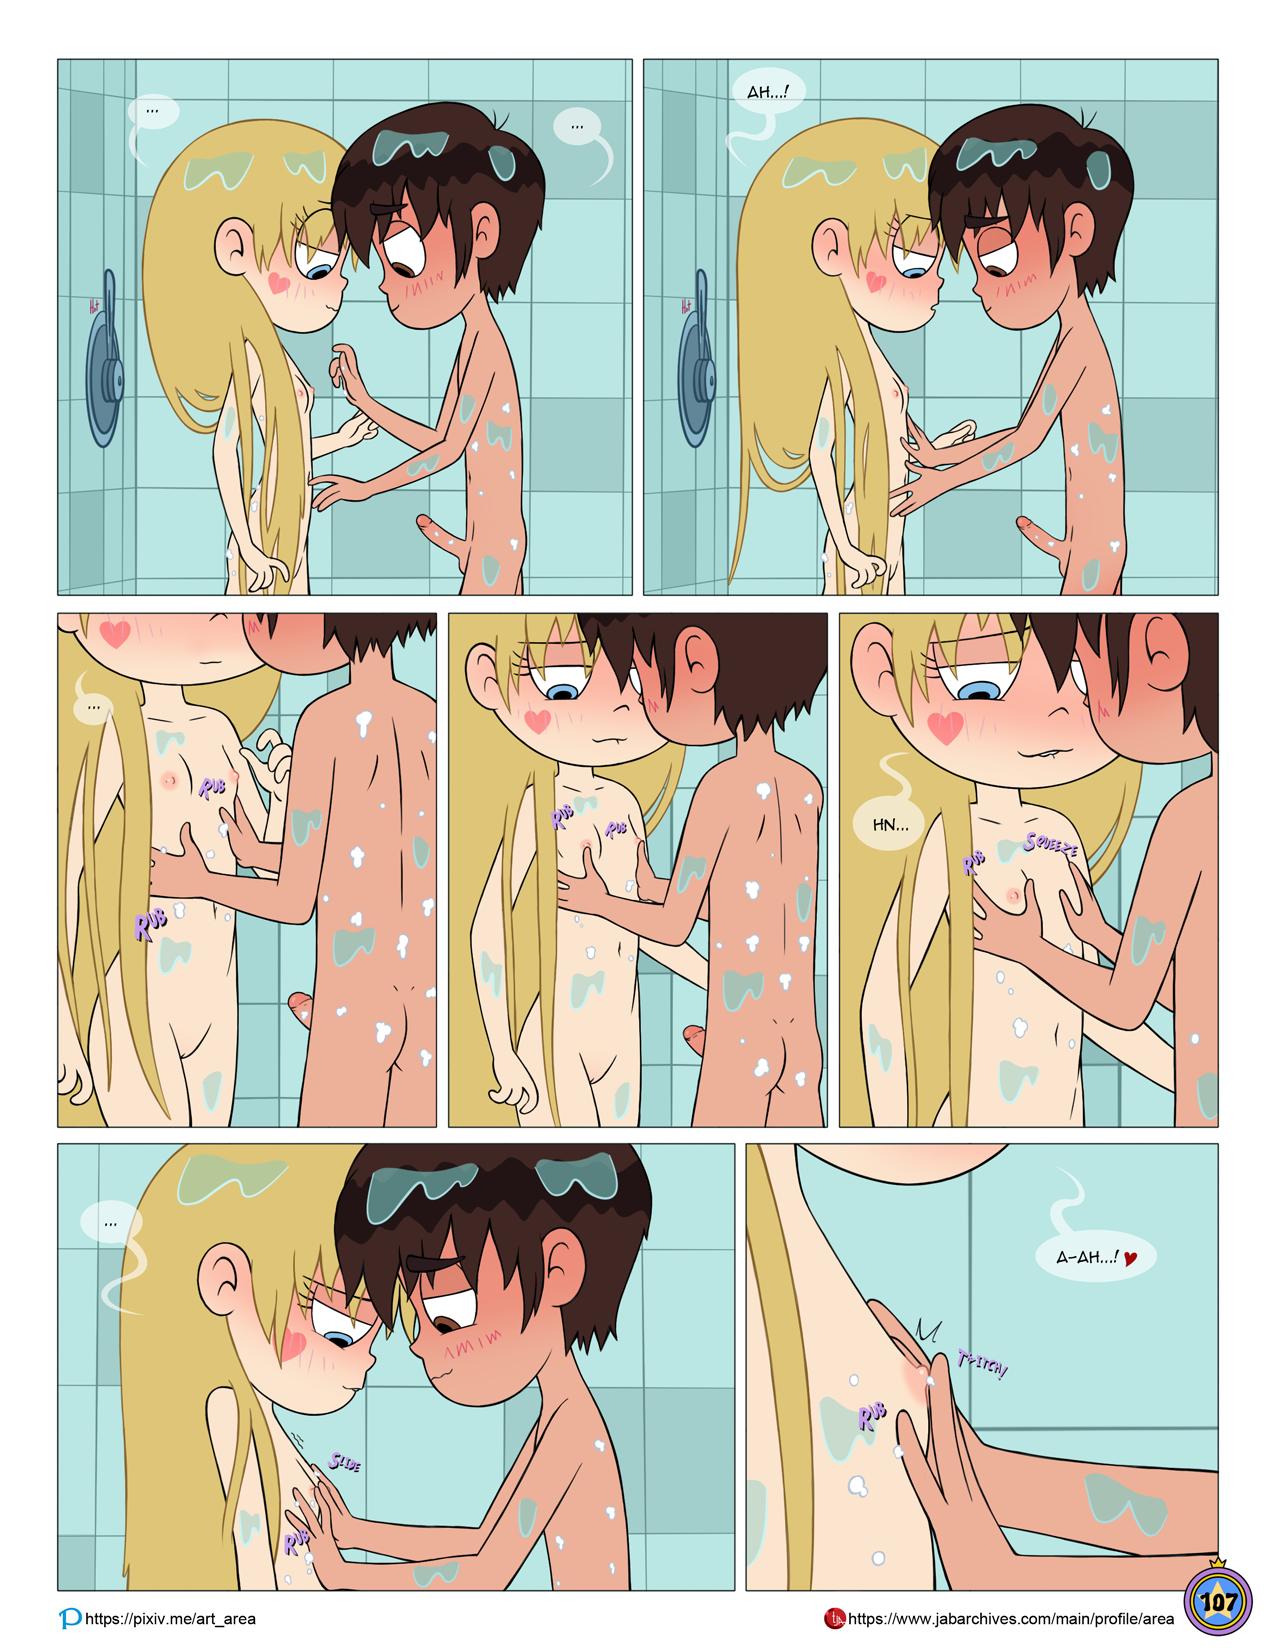 Between friends porn comic picture 108